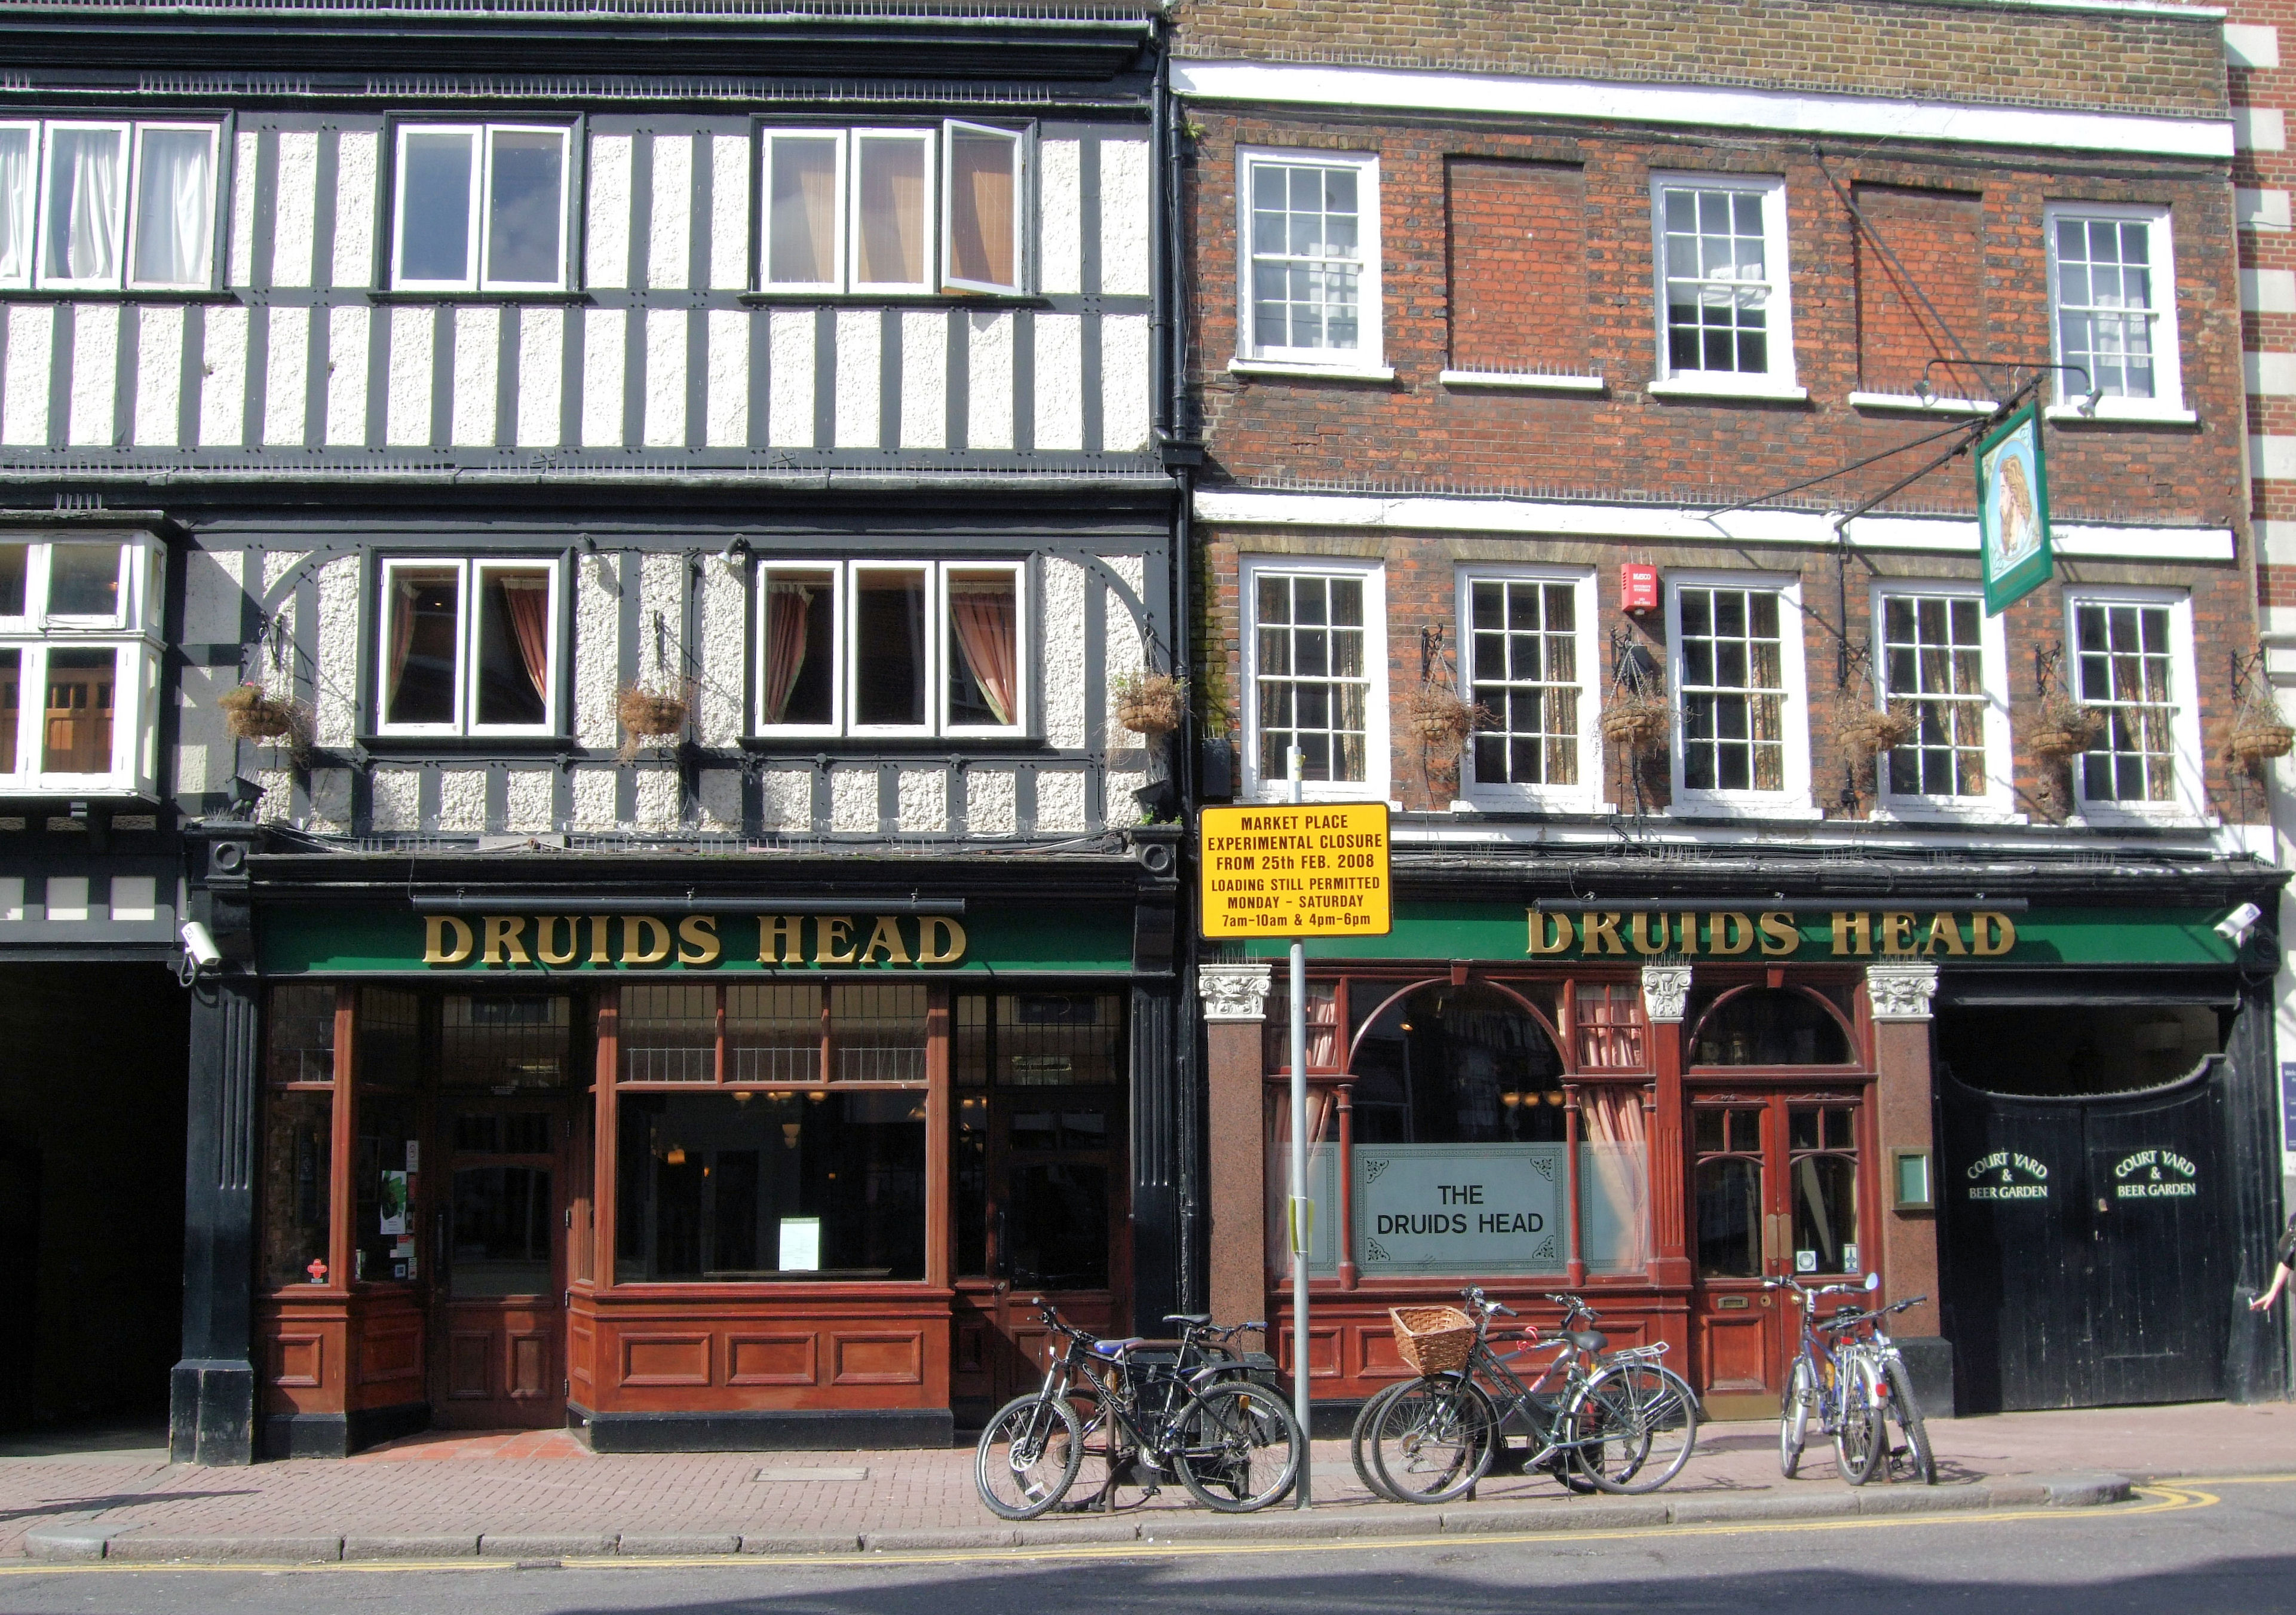 File:Druids Head Pub Kingston.jpg - Wikimedia Commons